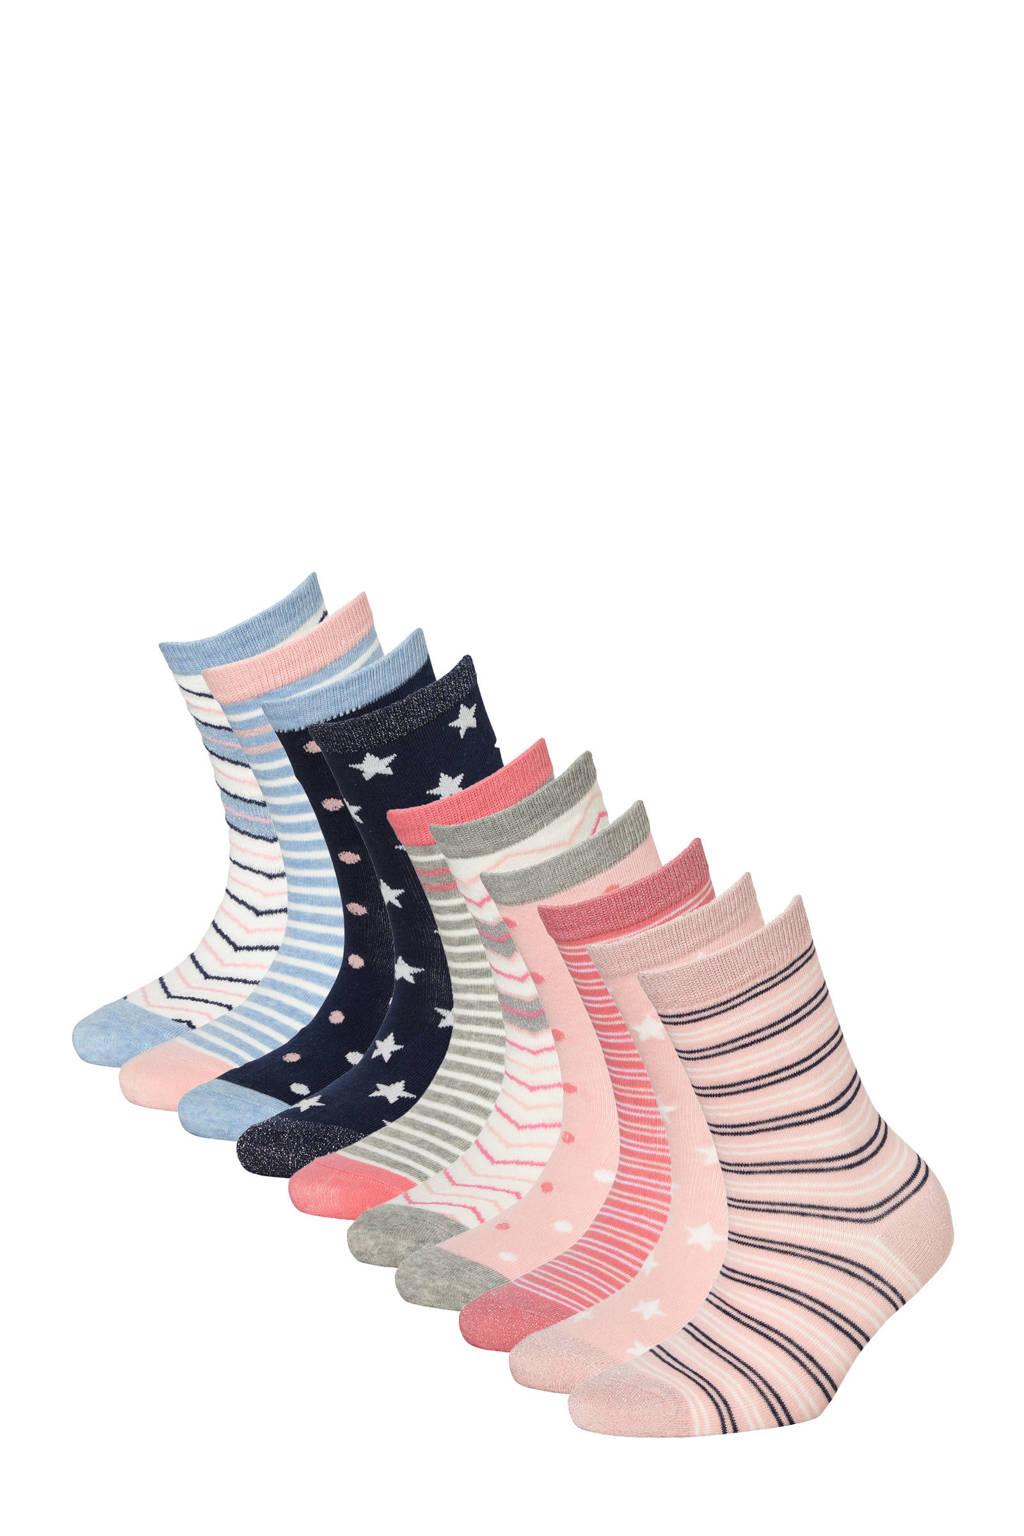 Apollo sokken - set van 10 blauw/roze, Blauw/roze